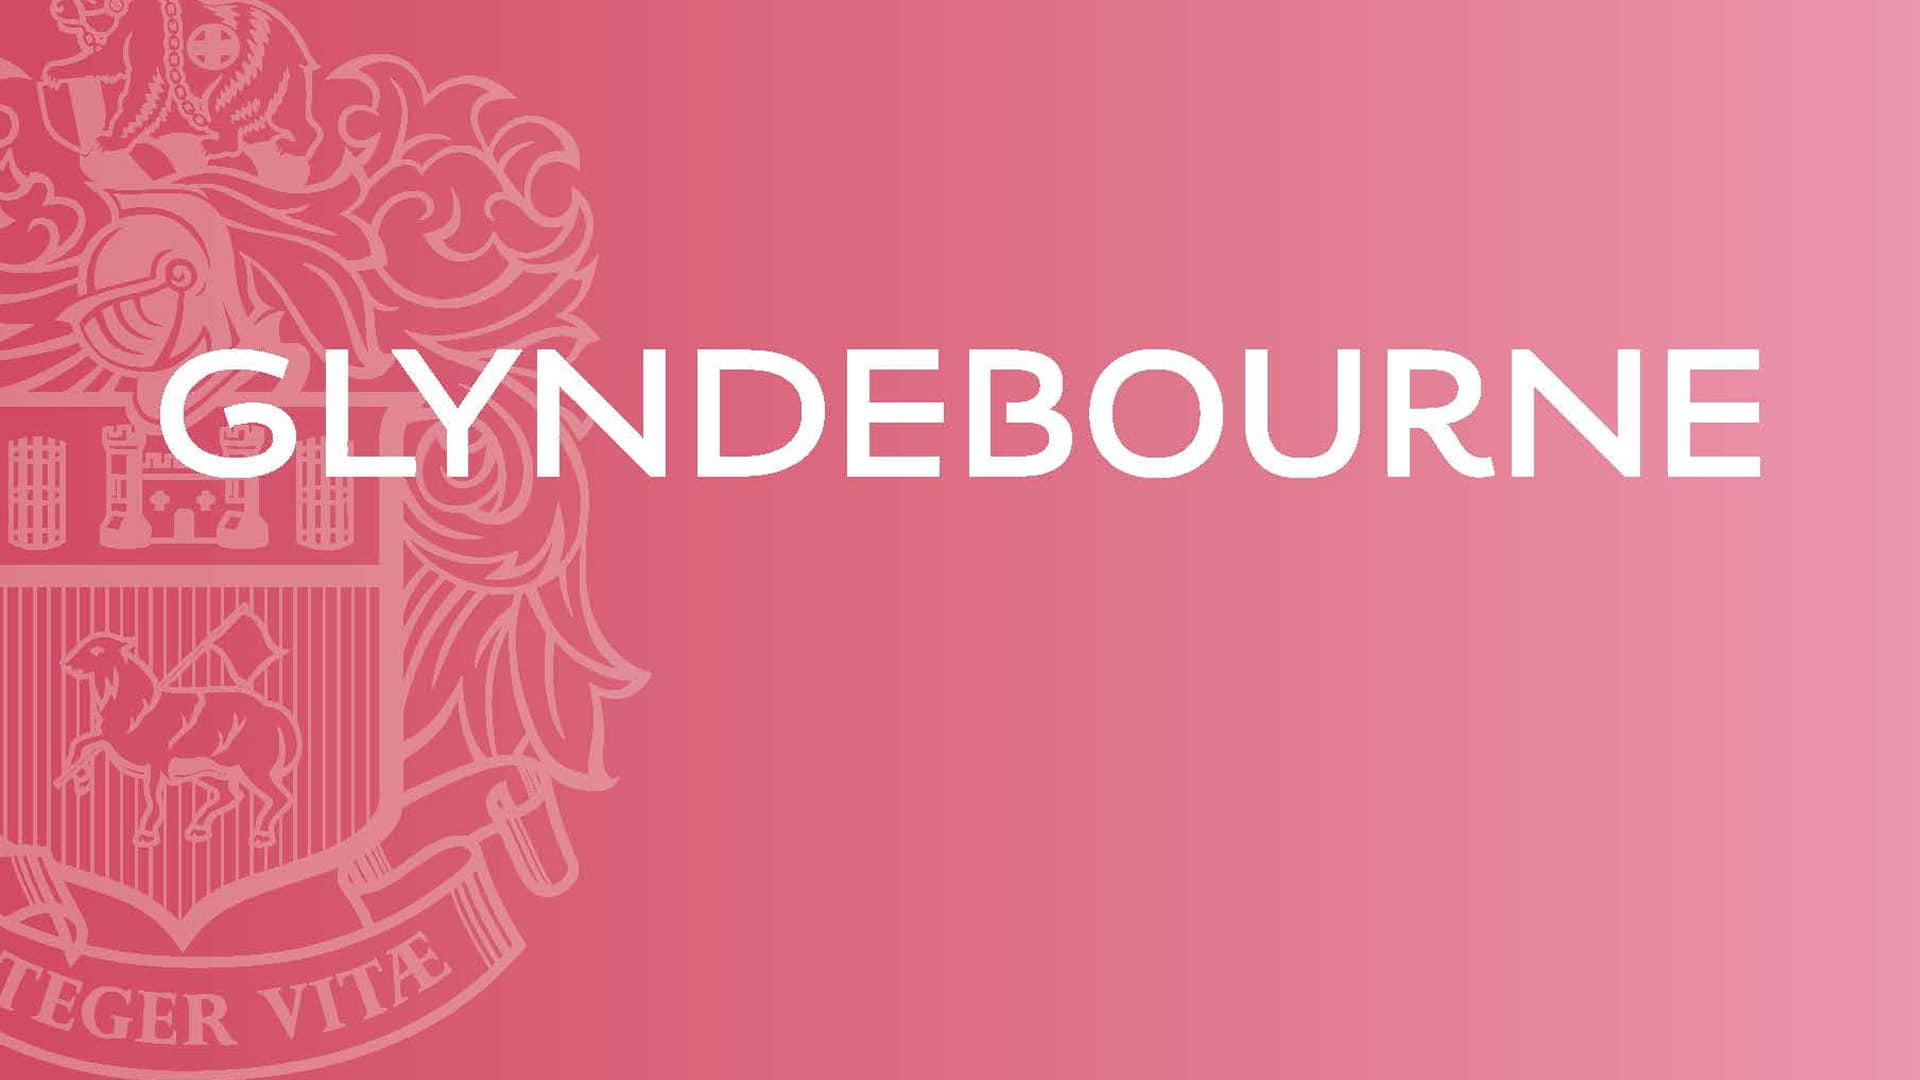 Suitenine win Glyndebourne Opera Design and Photography